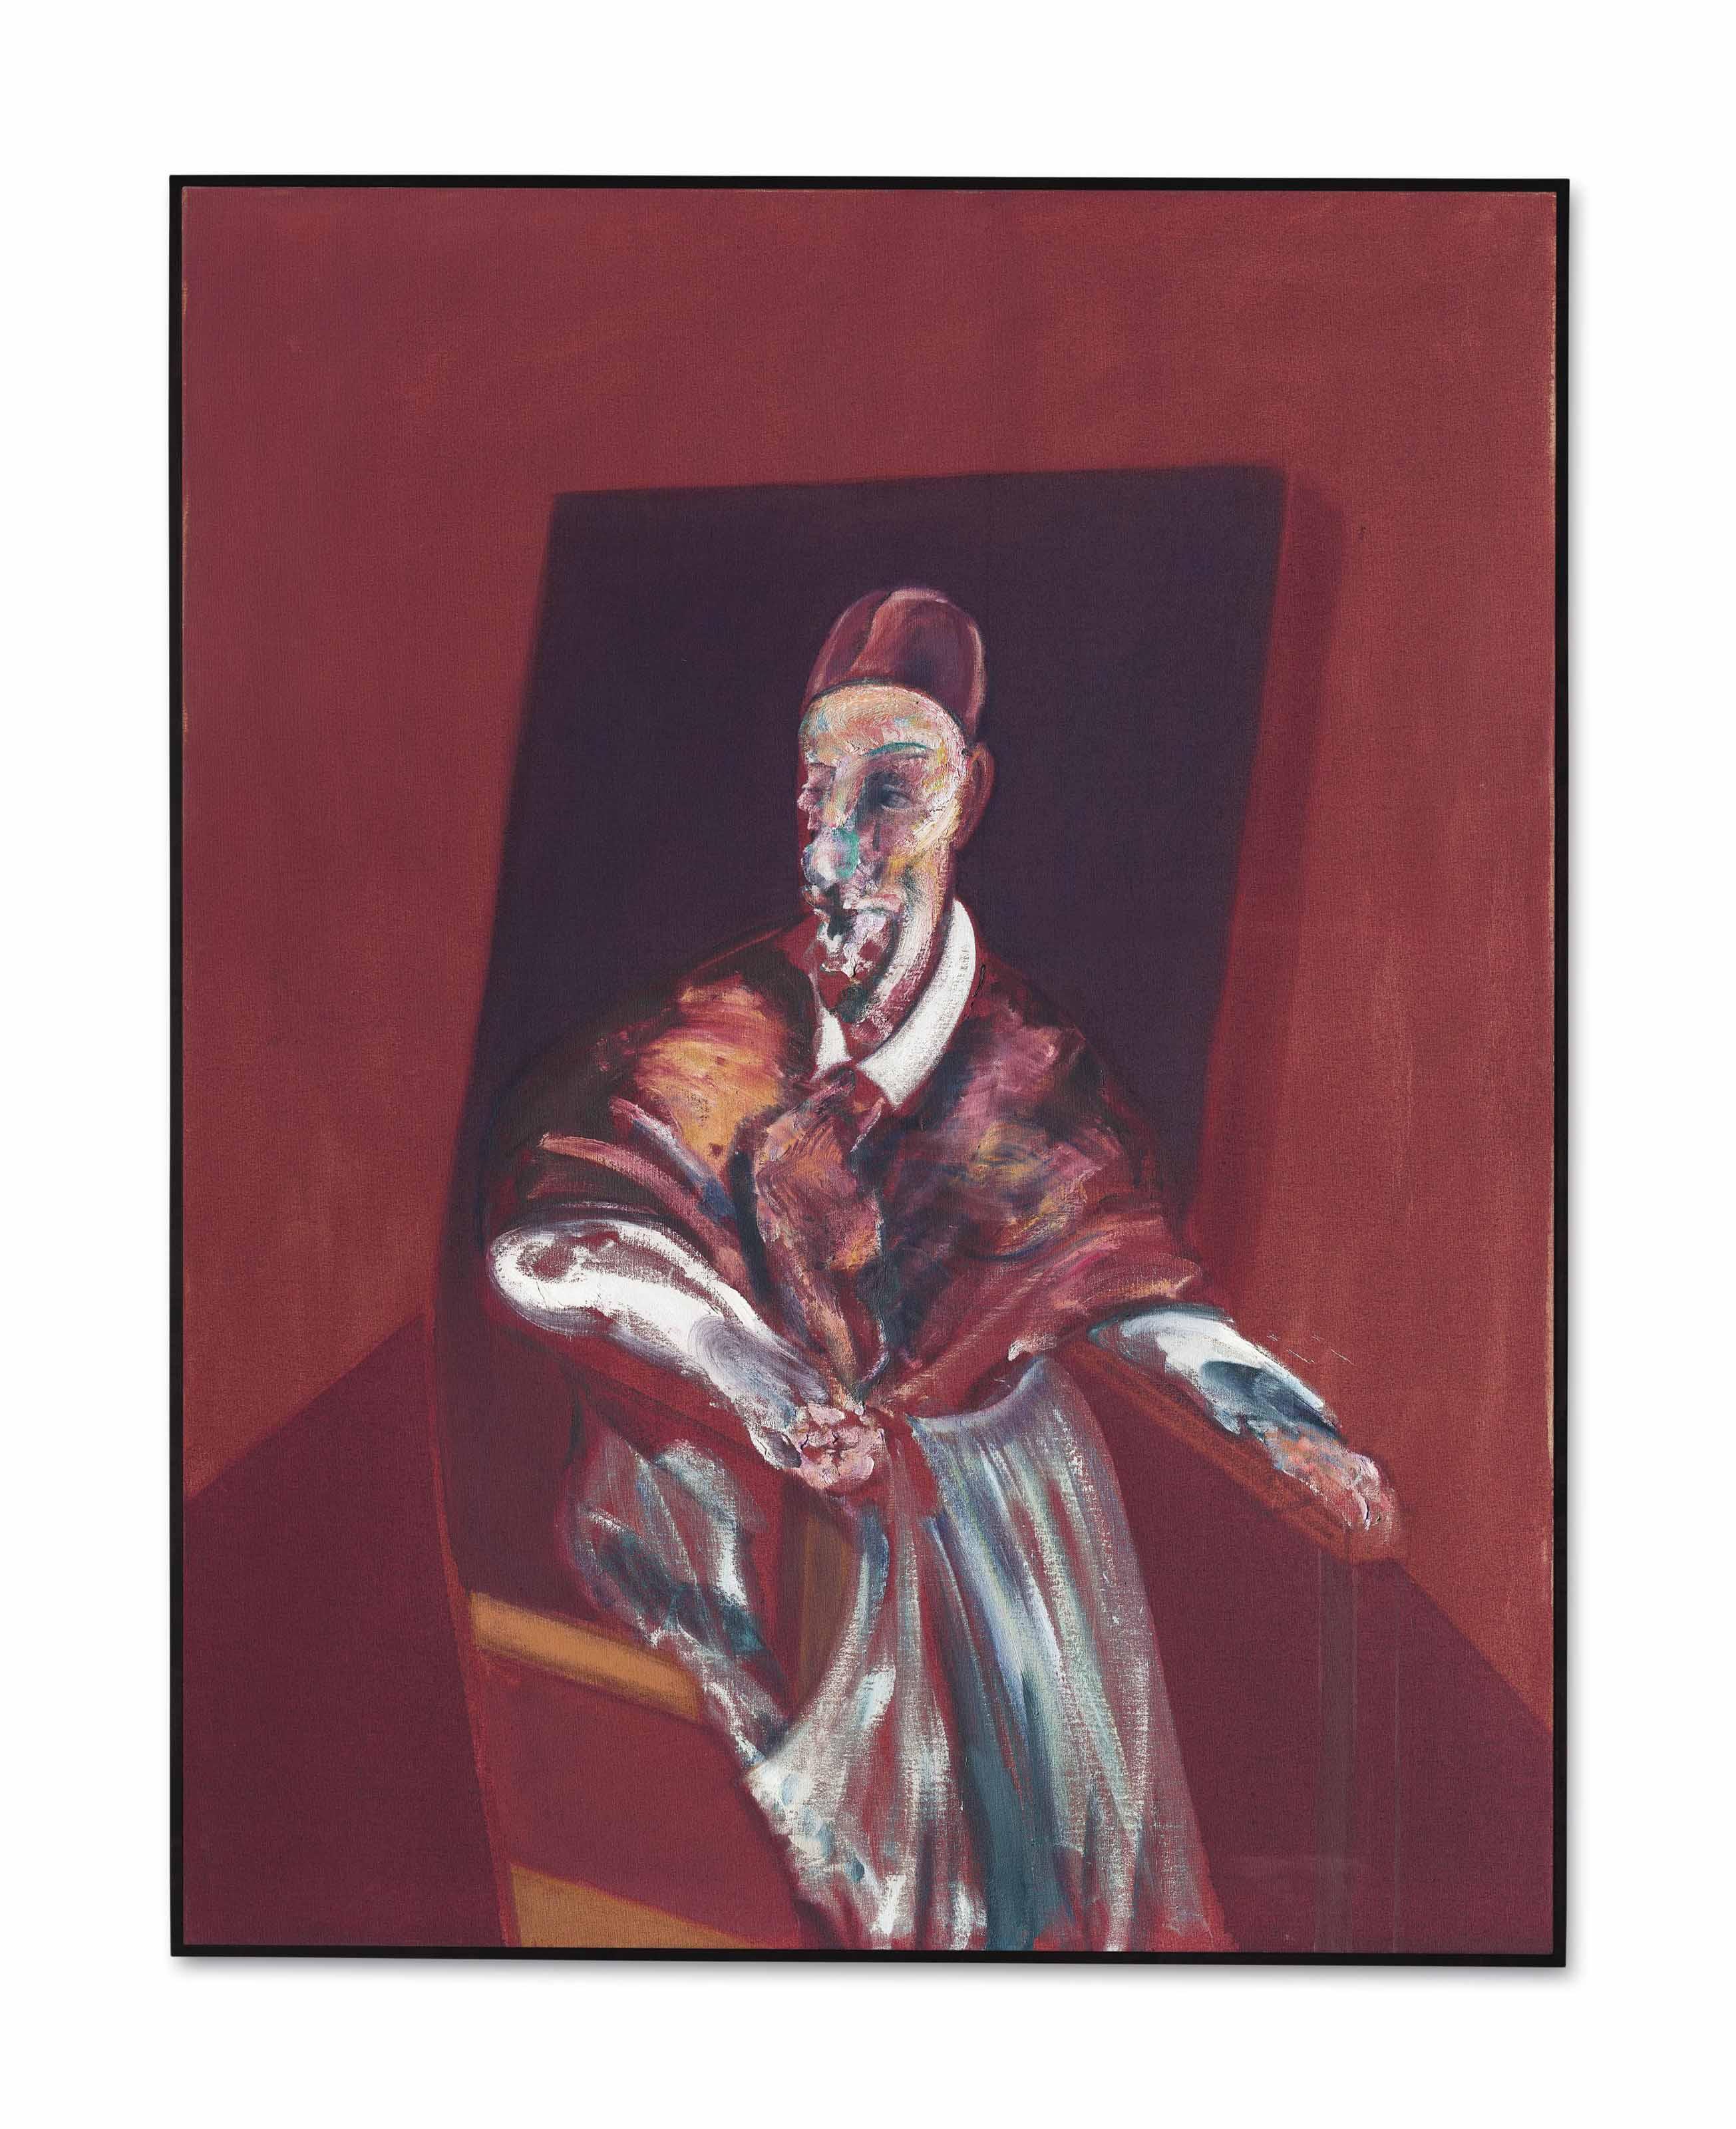 Audio: Francis Bacon, Seated Figure